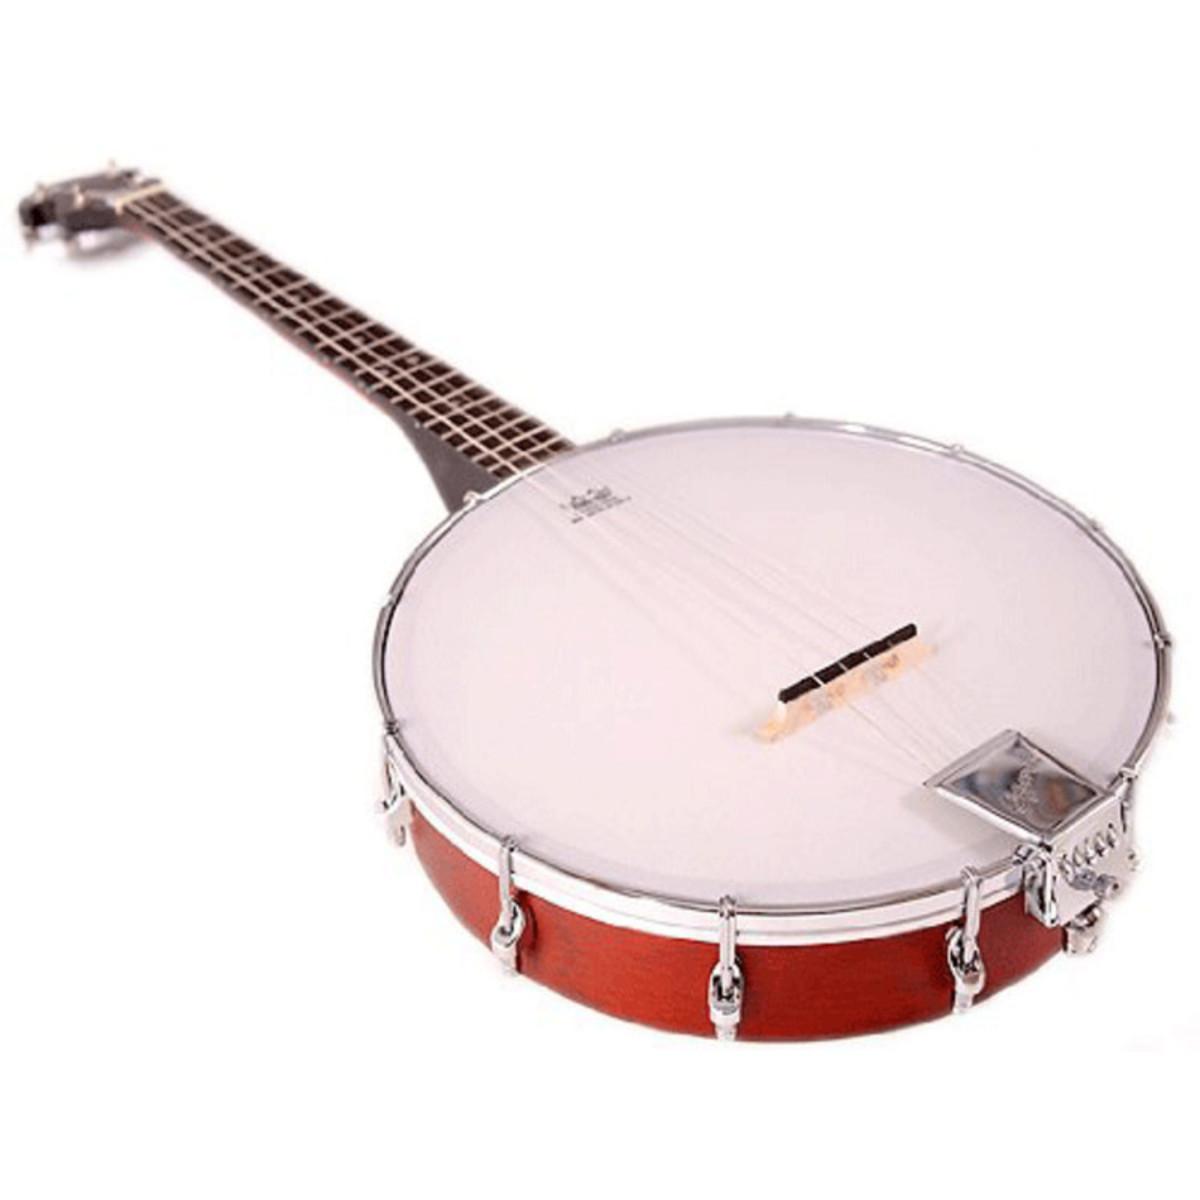 ozark 2102t tenor banjo mit gigbag b ware bei gear4music. Black Bedroom Furniture Sets. Home Design Ideas